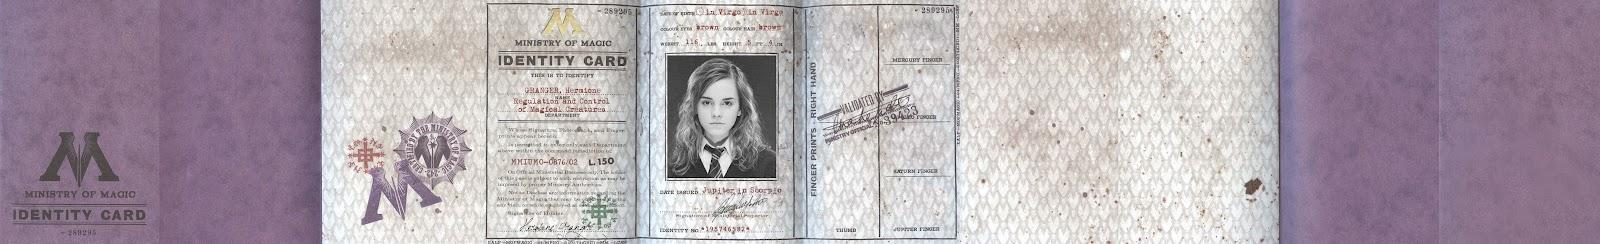 heres my customized hermione granger mom id cardbooklet